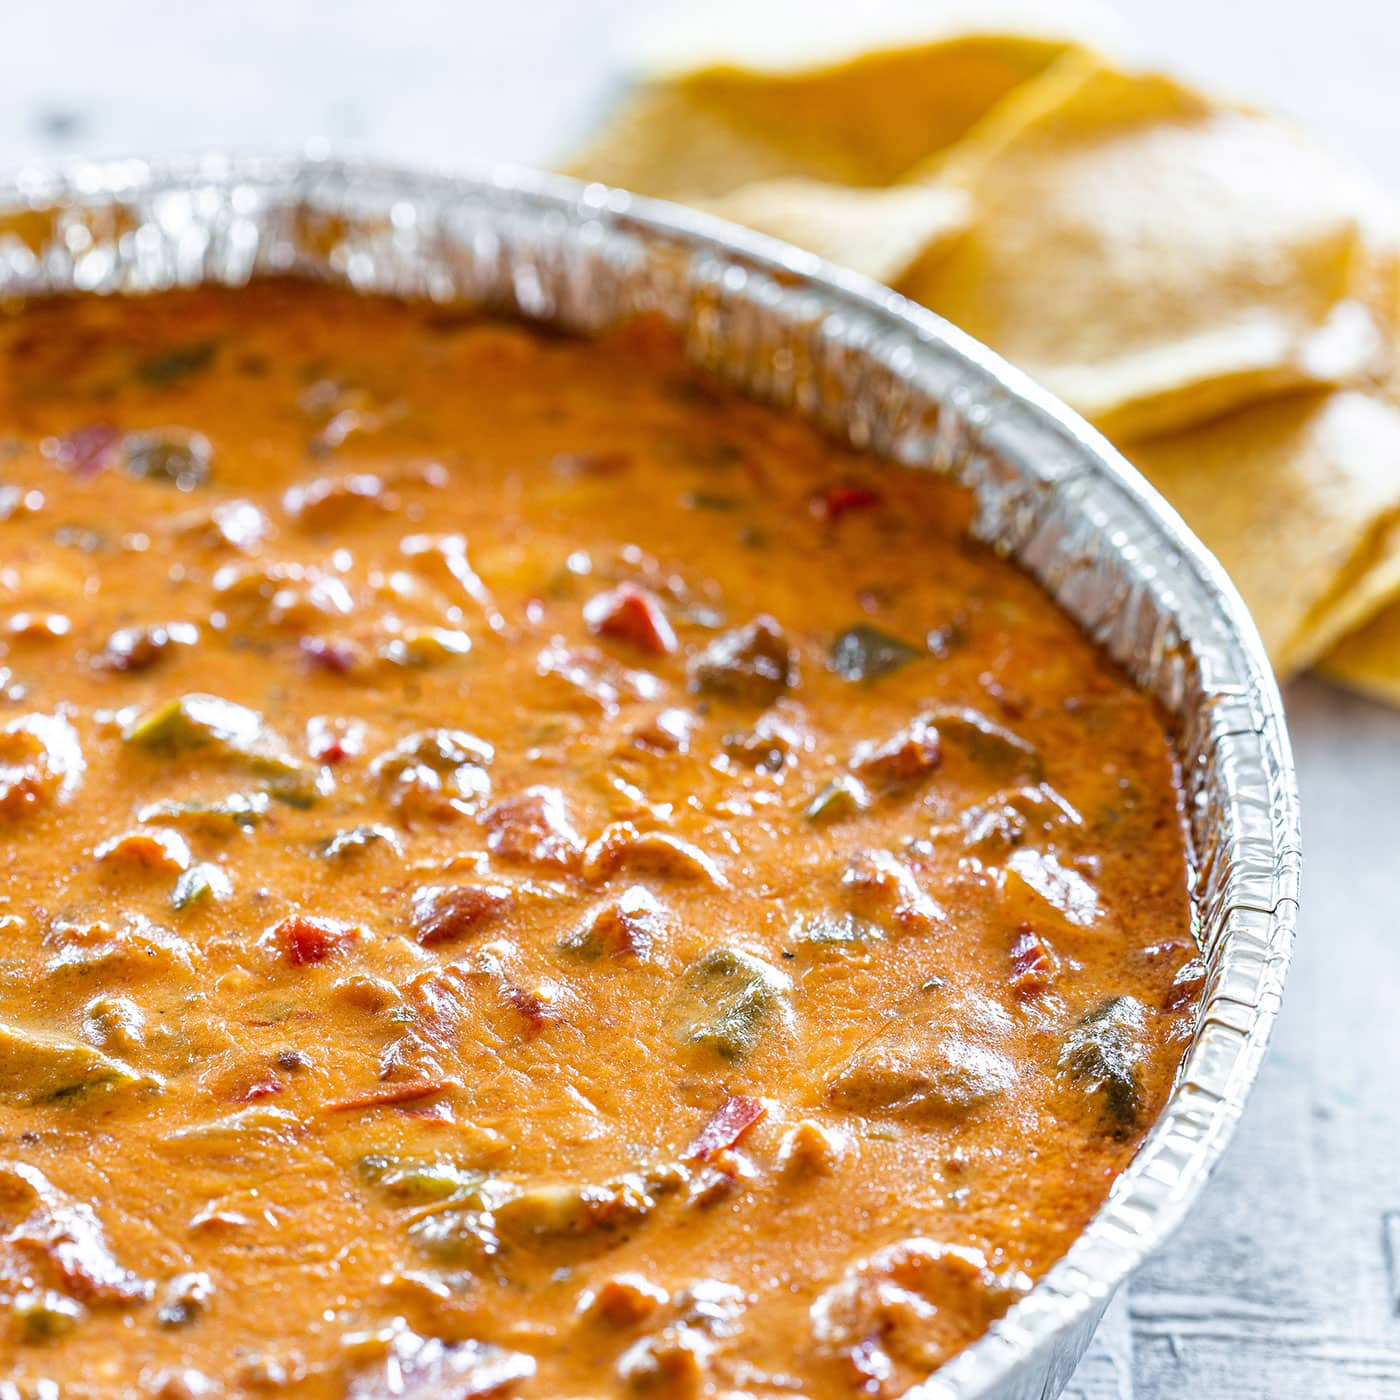 Tex-mex smoked queso recipe on a aluminium foil pan.